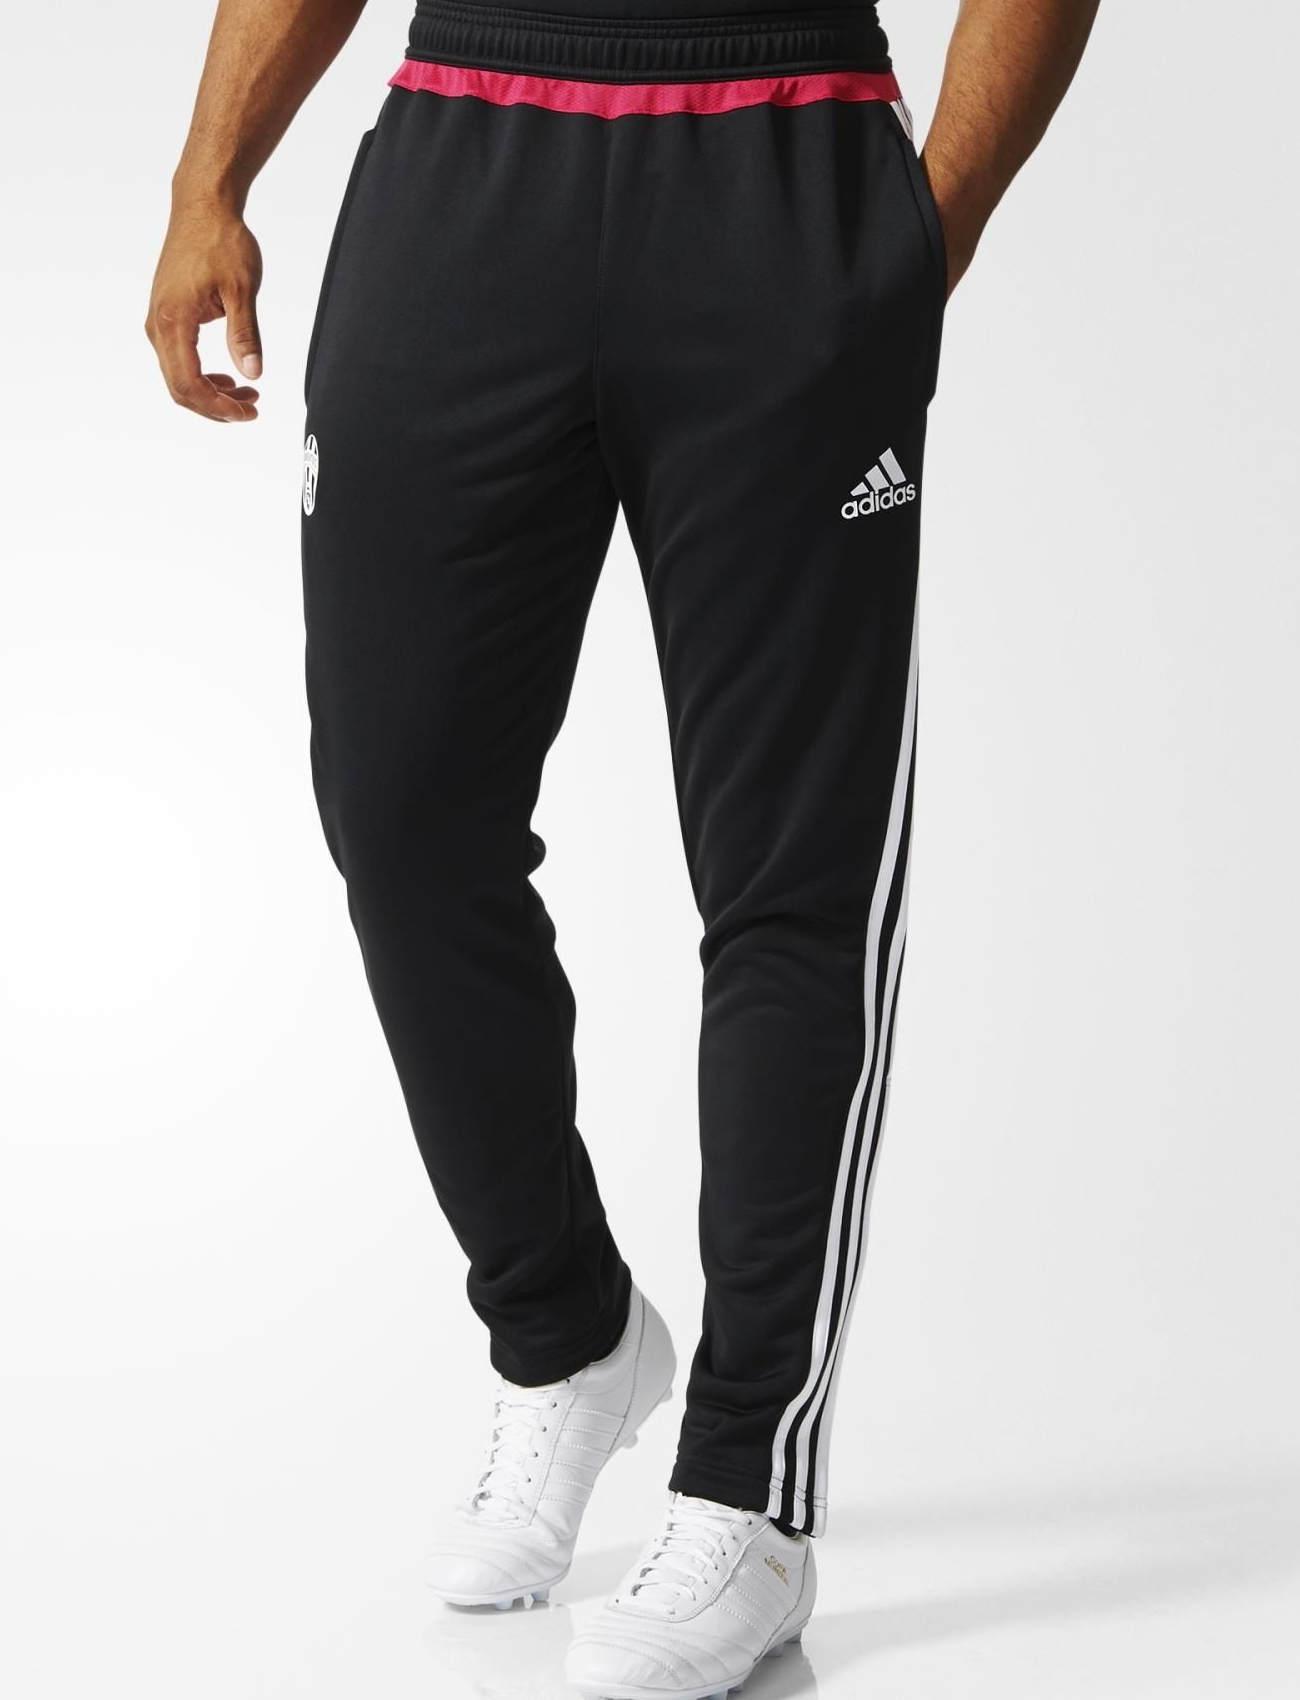 pantaloni tuta adidas